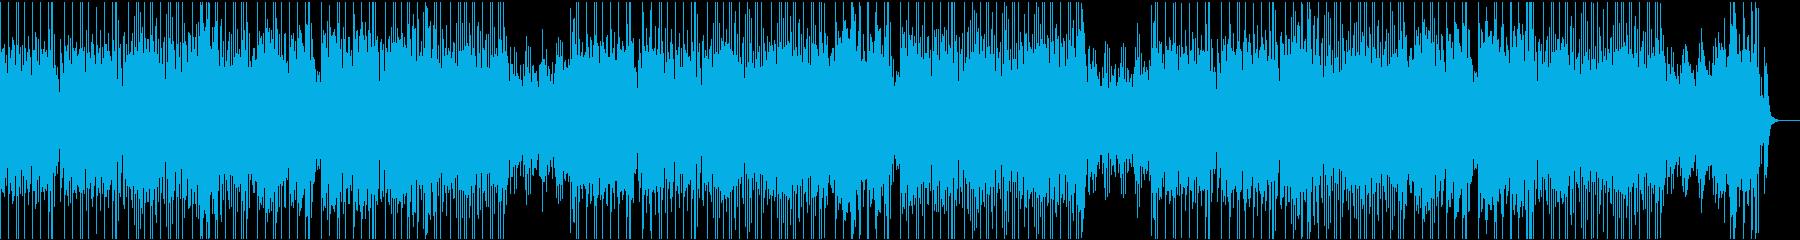 Refreshing violin's reproduced waveform